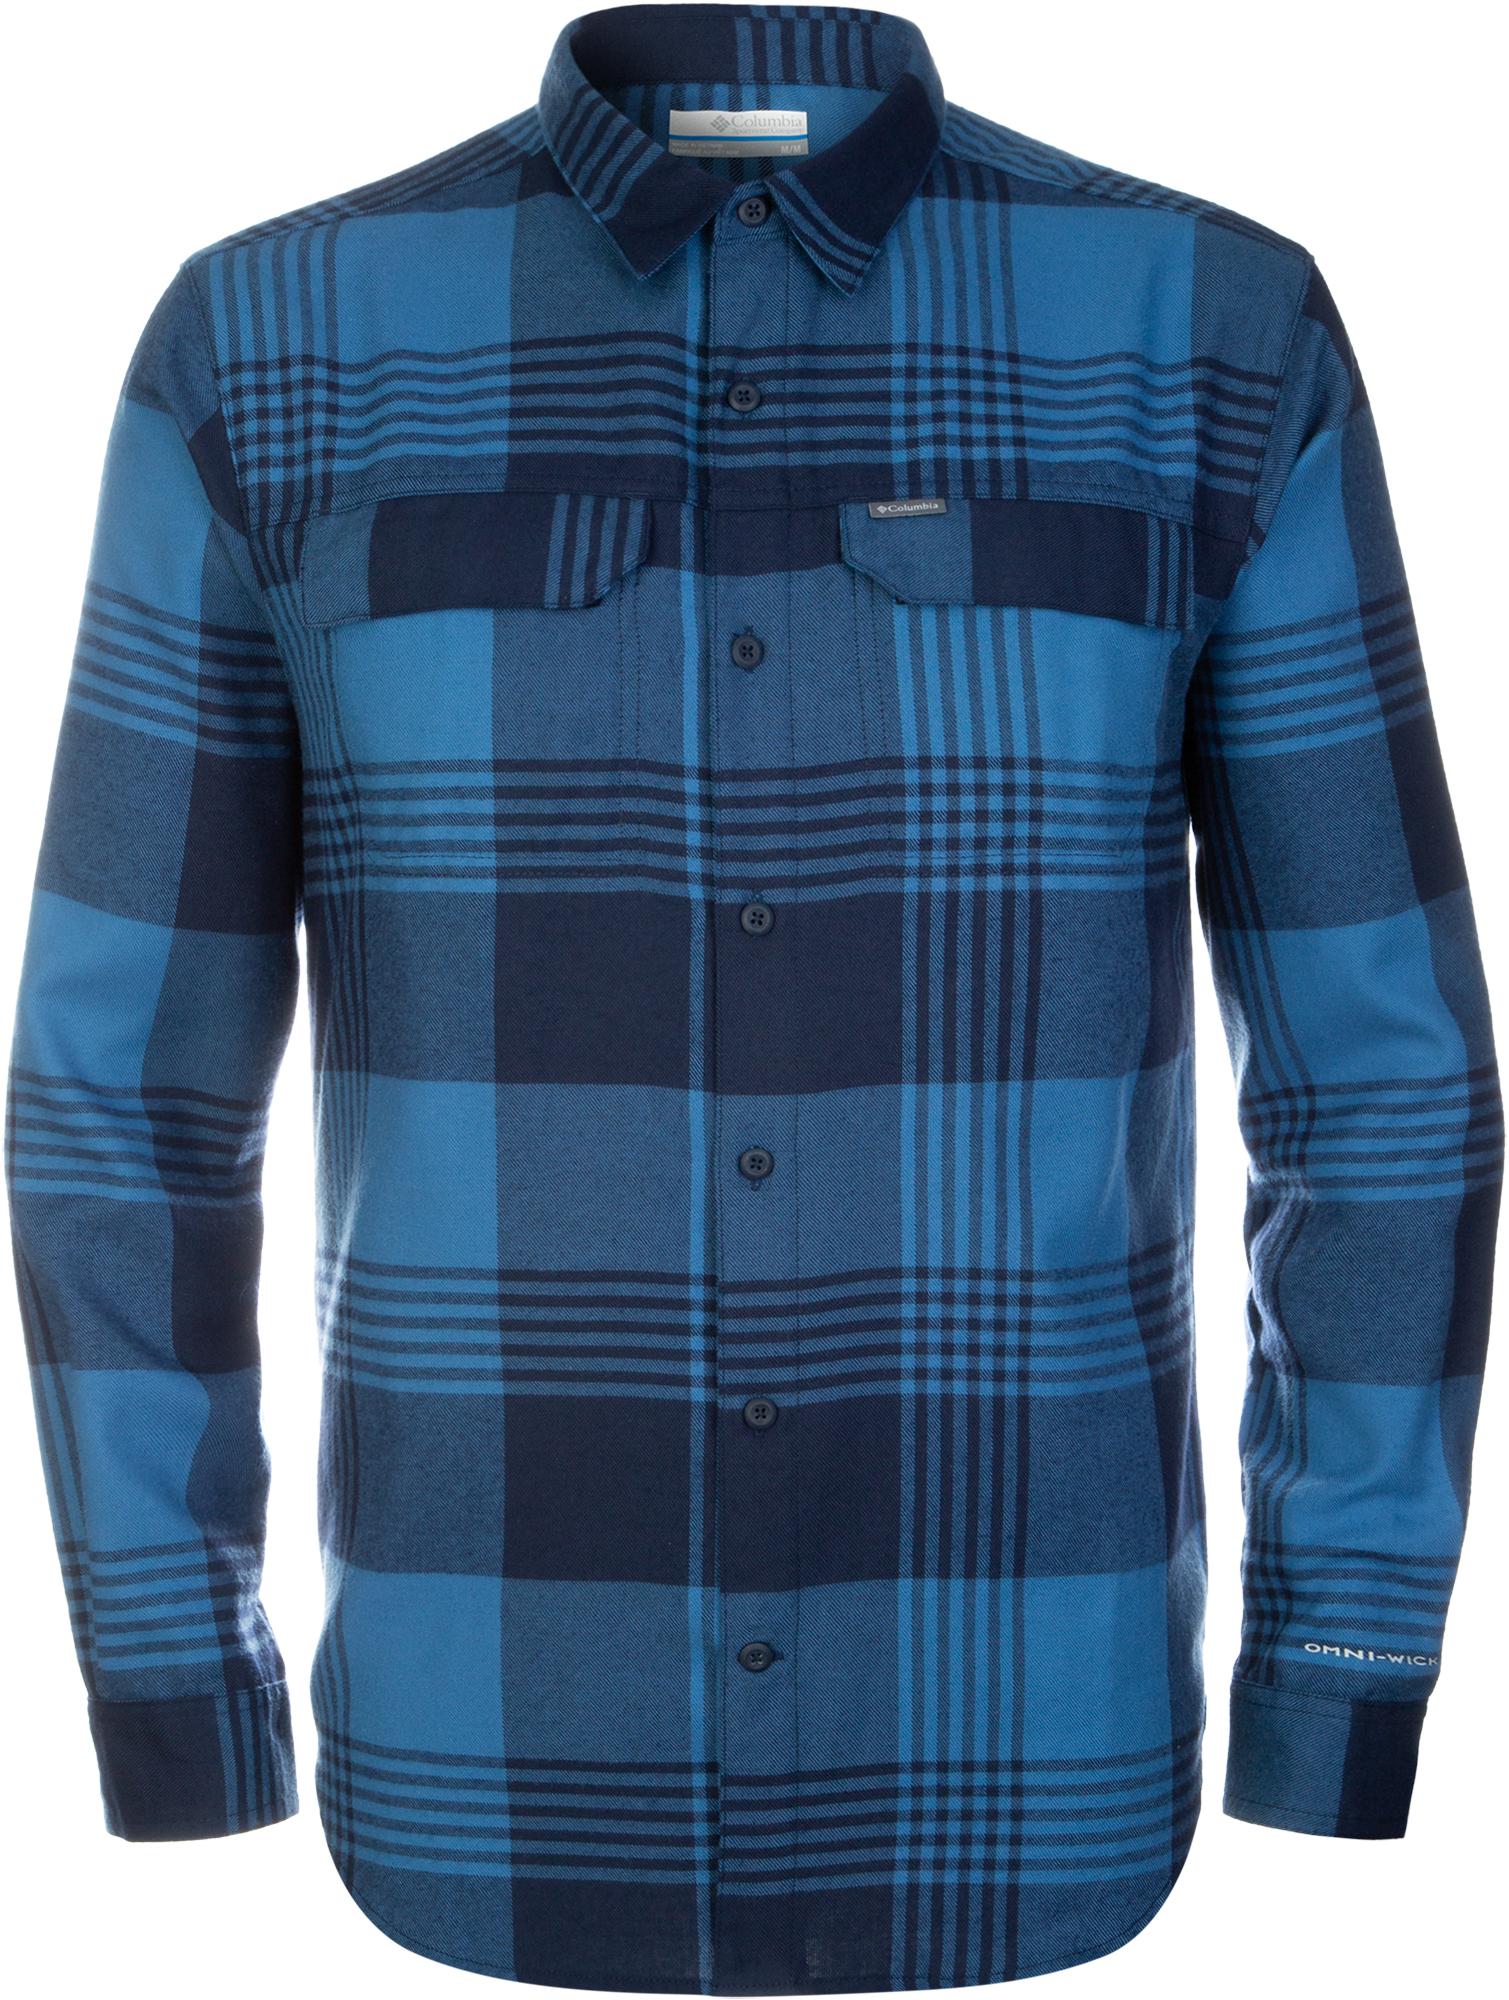 цена Columbia Рубашка мужская Columbia Silver Ridge 2.0, размер 52-54 онлайн в 2017 году